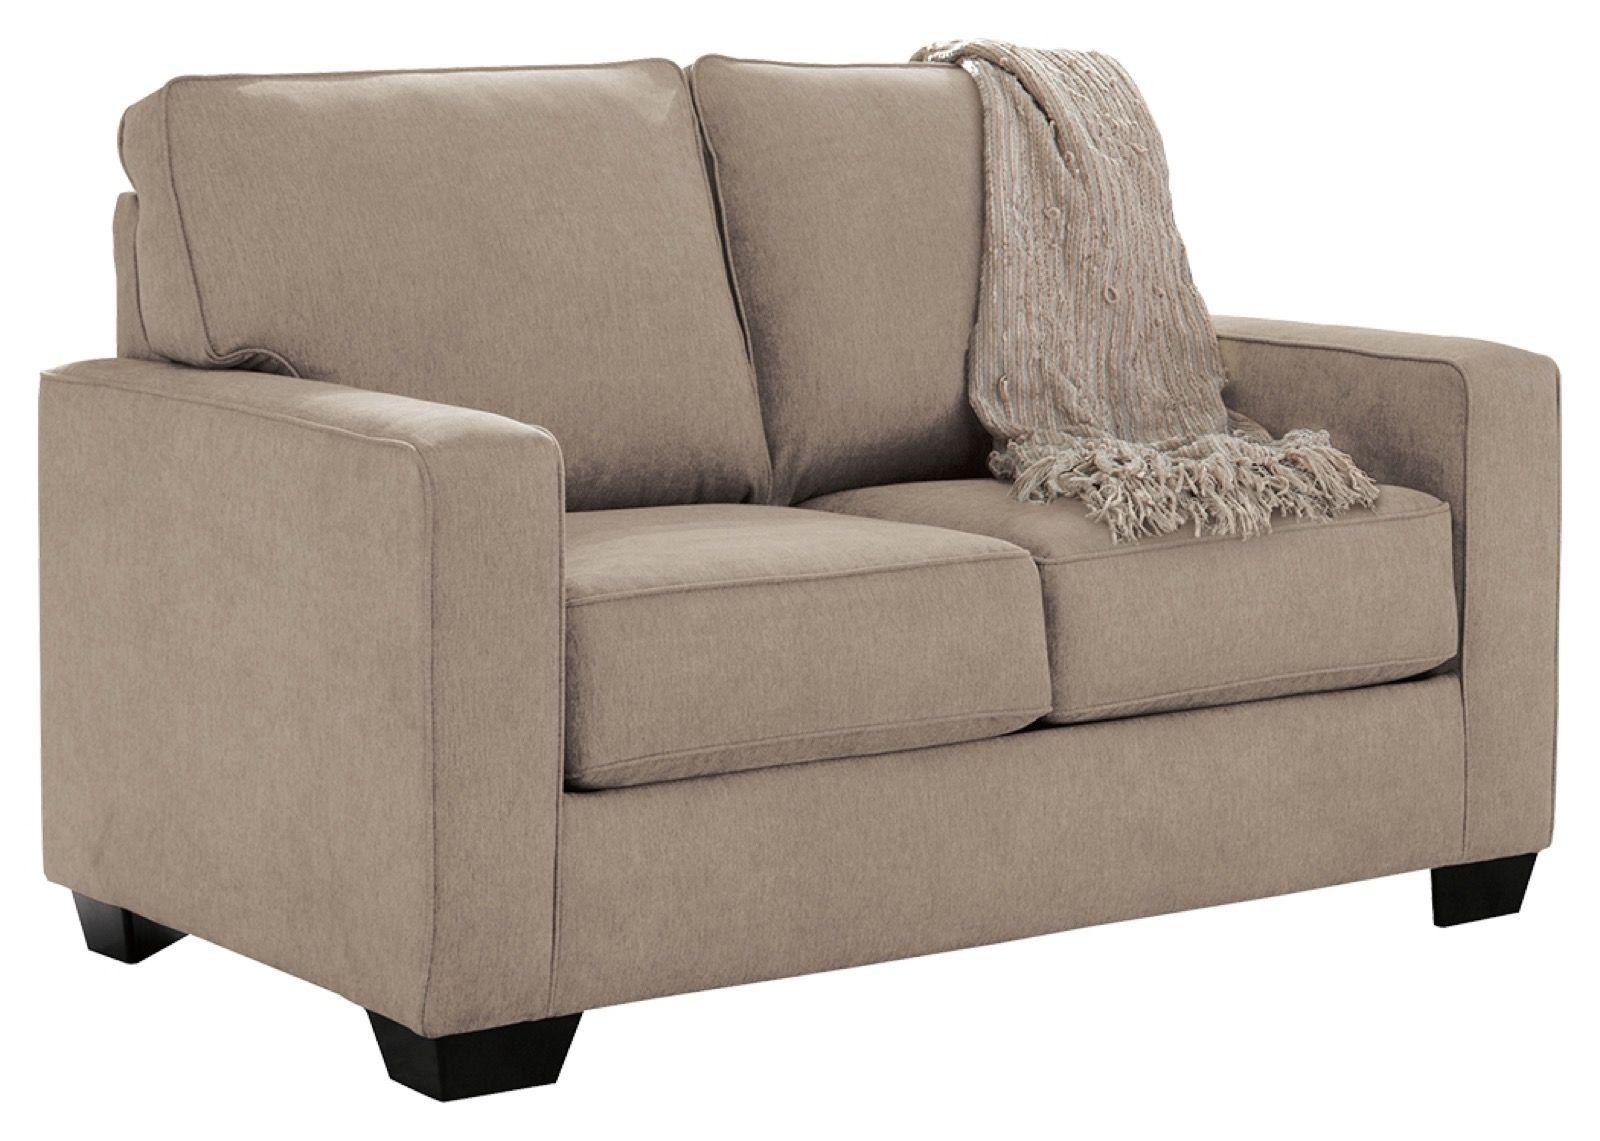 - Signature Design Zeb Quartz Twin Sofa Sleeper - Sofas - Living